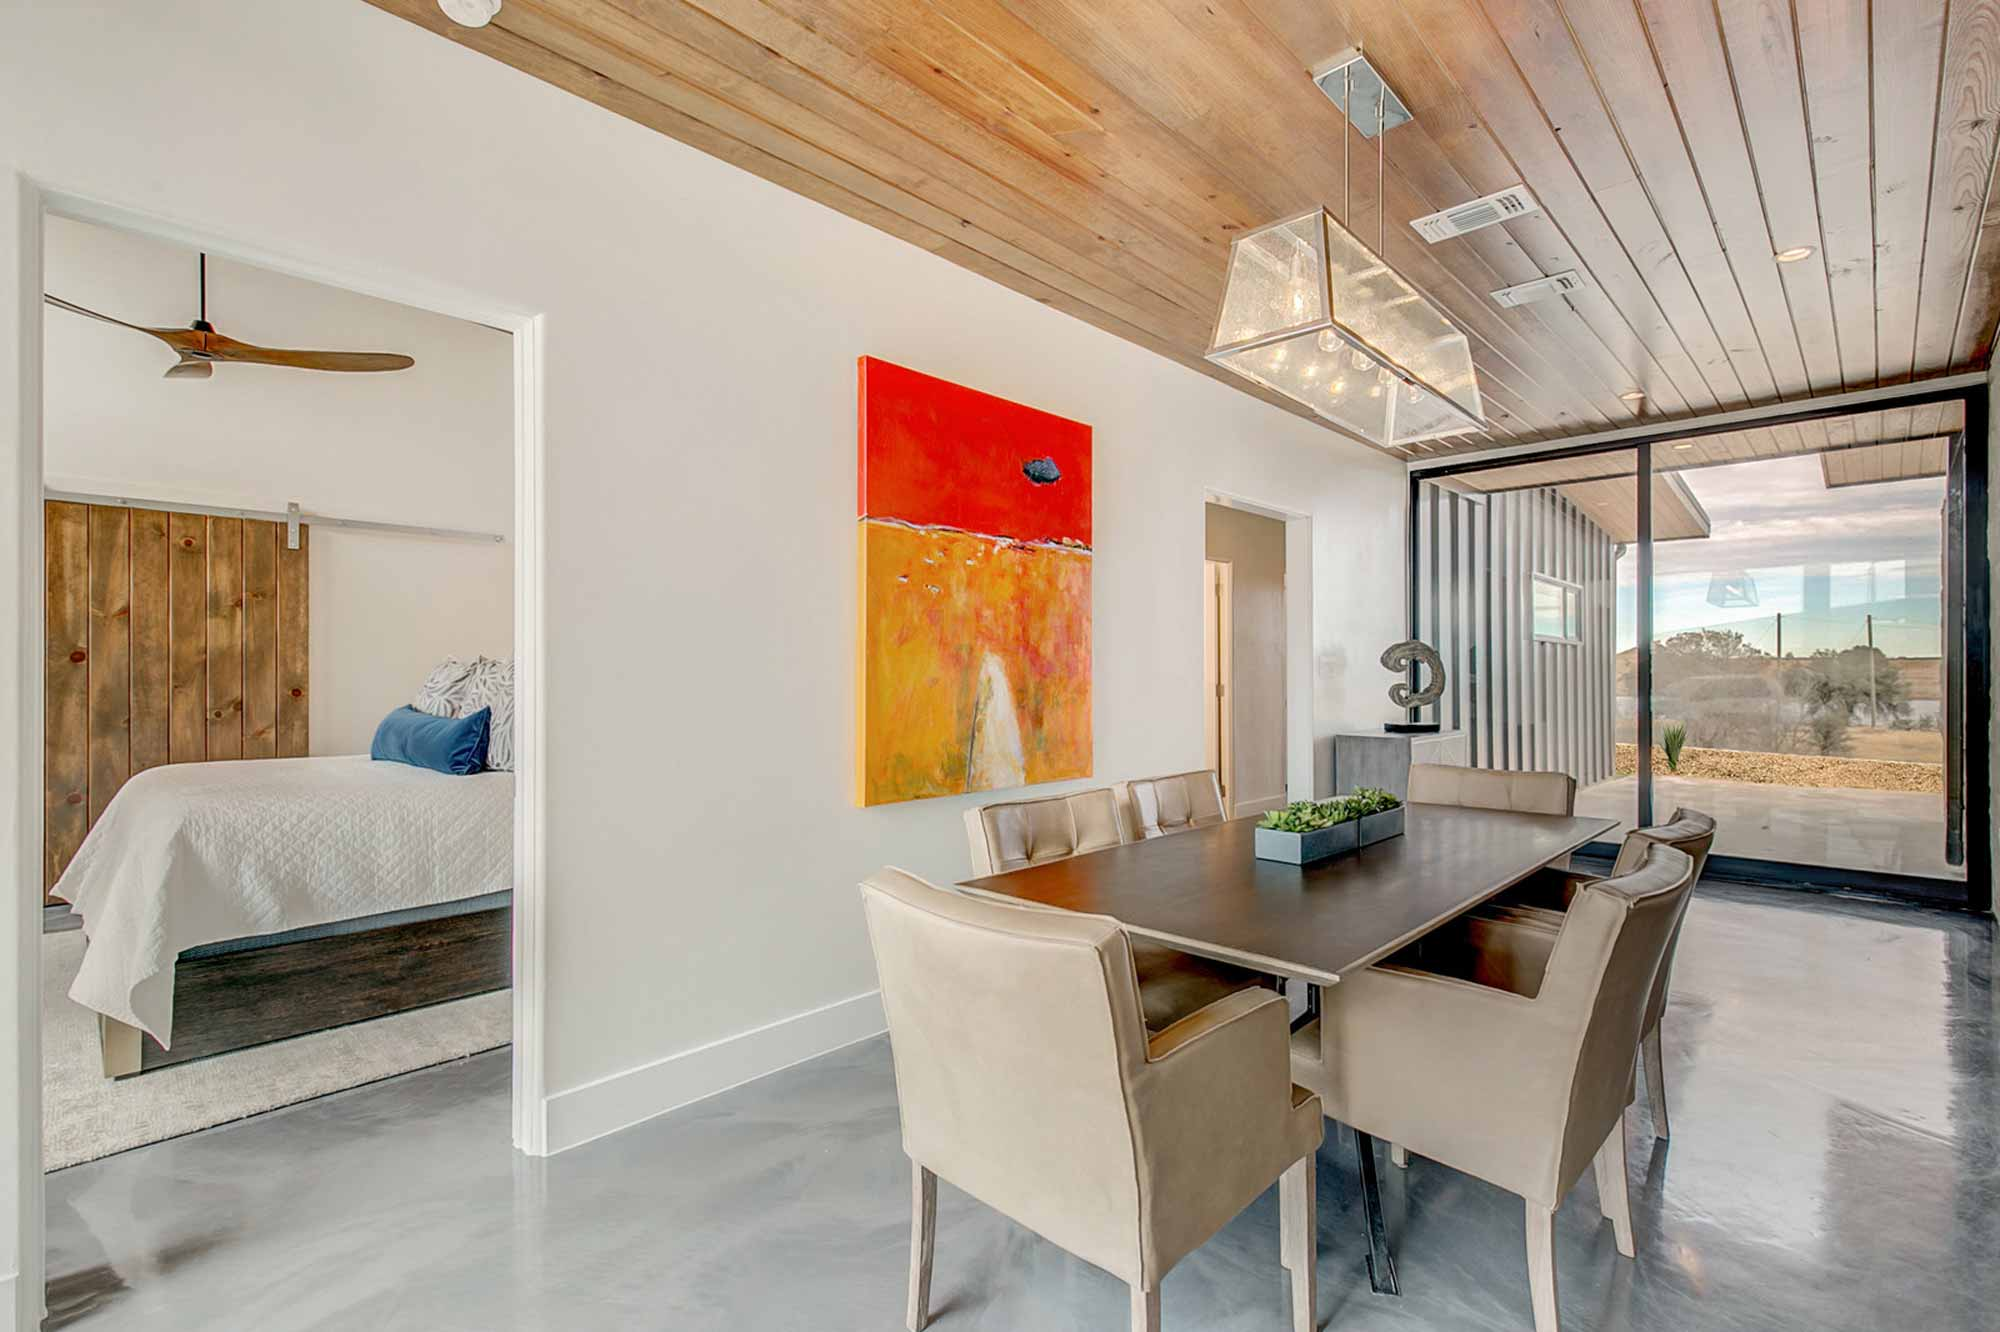 Steve-Bumpas-Custom_Homes-The-Residences-at-Rough-Creek-Lodge-The-Brook-Lot-17-03-Luxury-Ranch-Rough-Creek-Lodge-Texas-Luxury.jpg